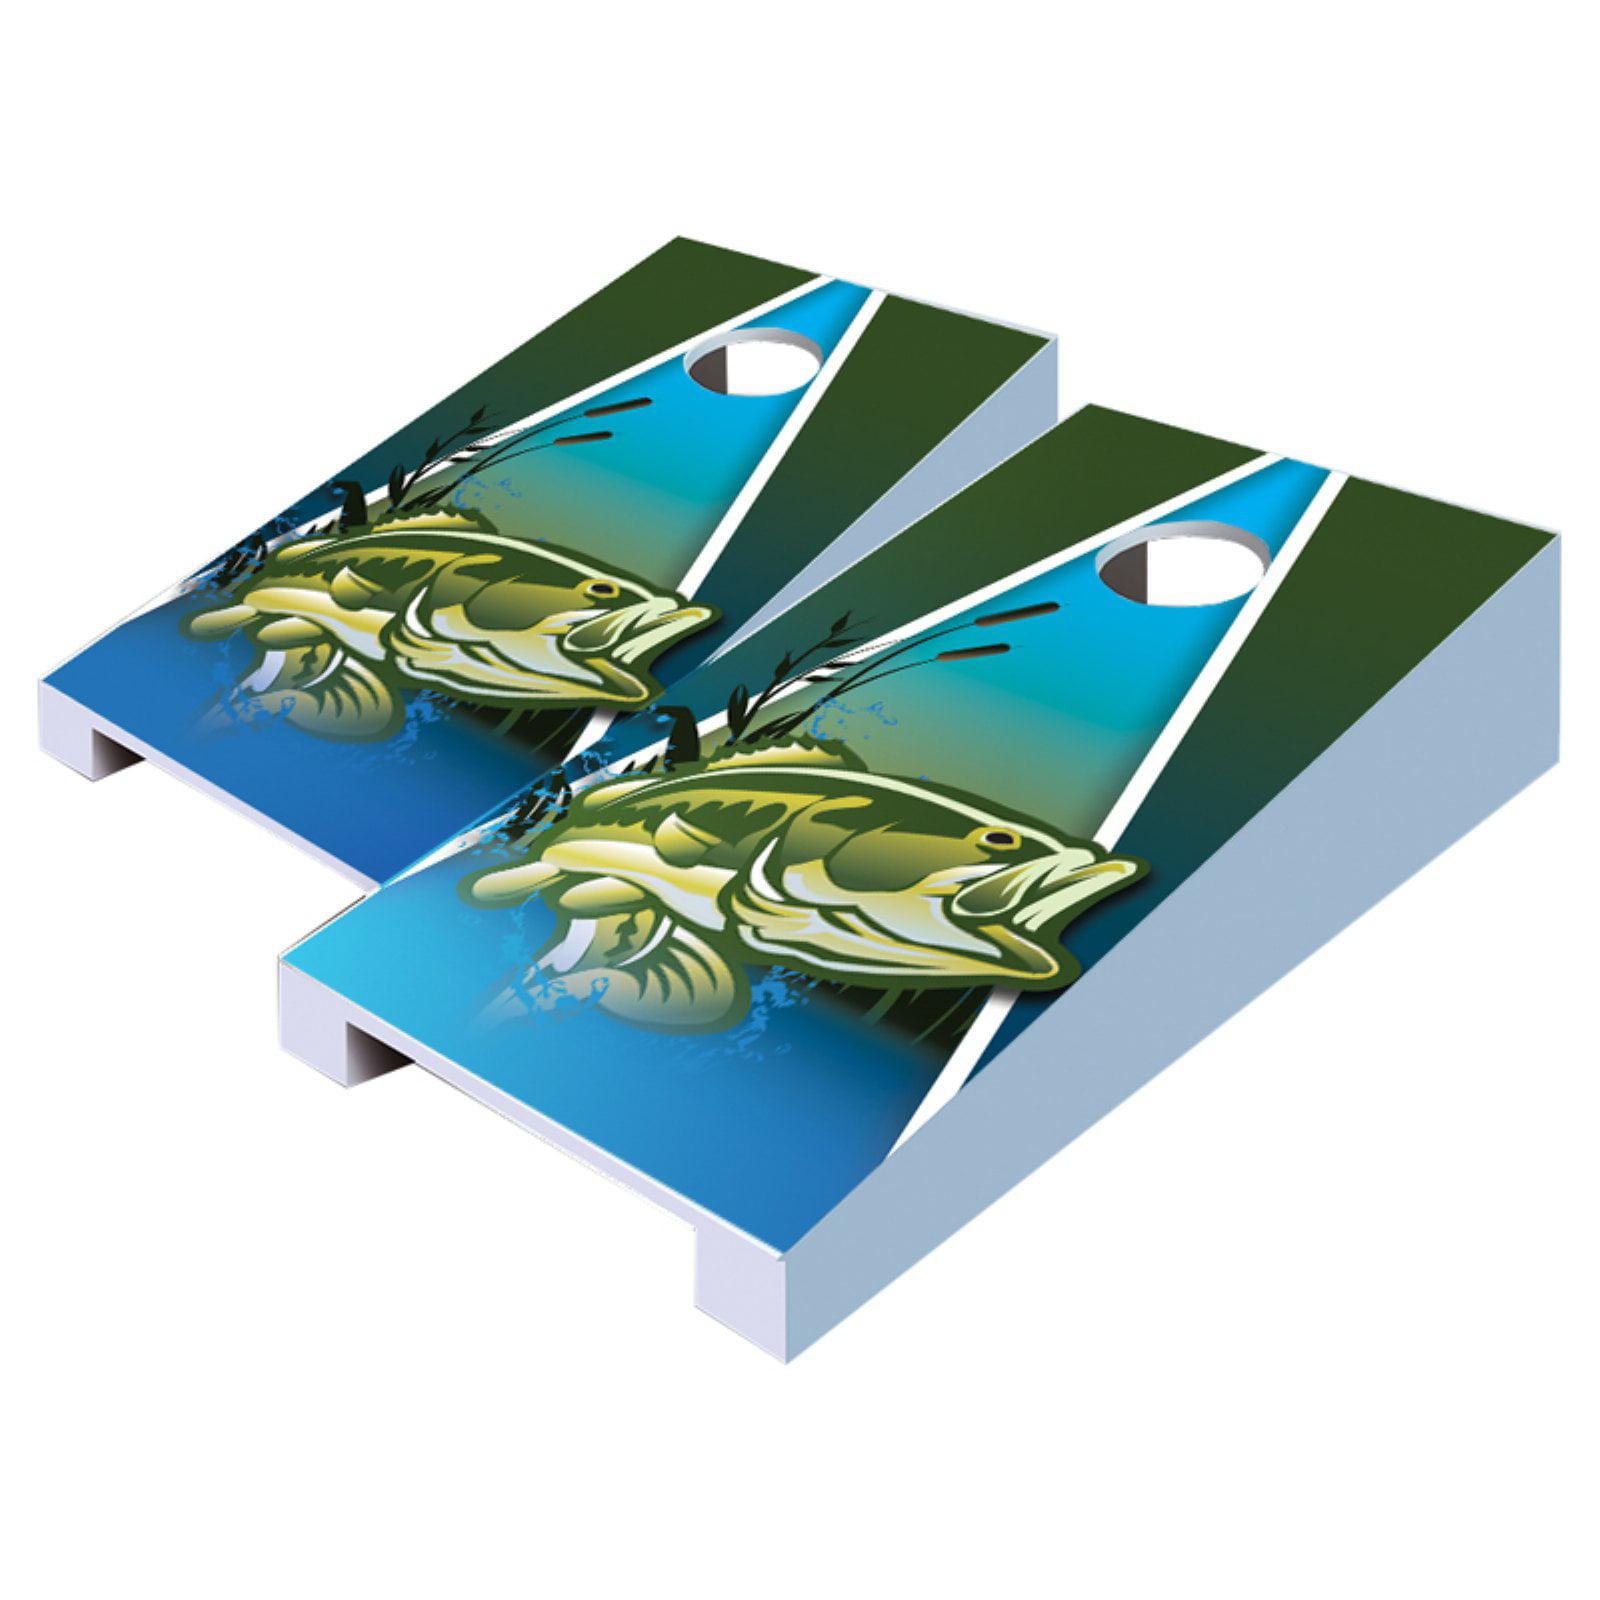 Fish Tabletop Cornhole Set by AJJ Cornhole